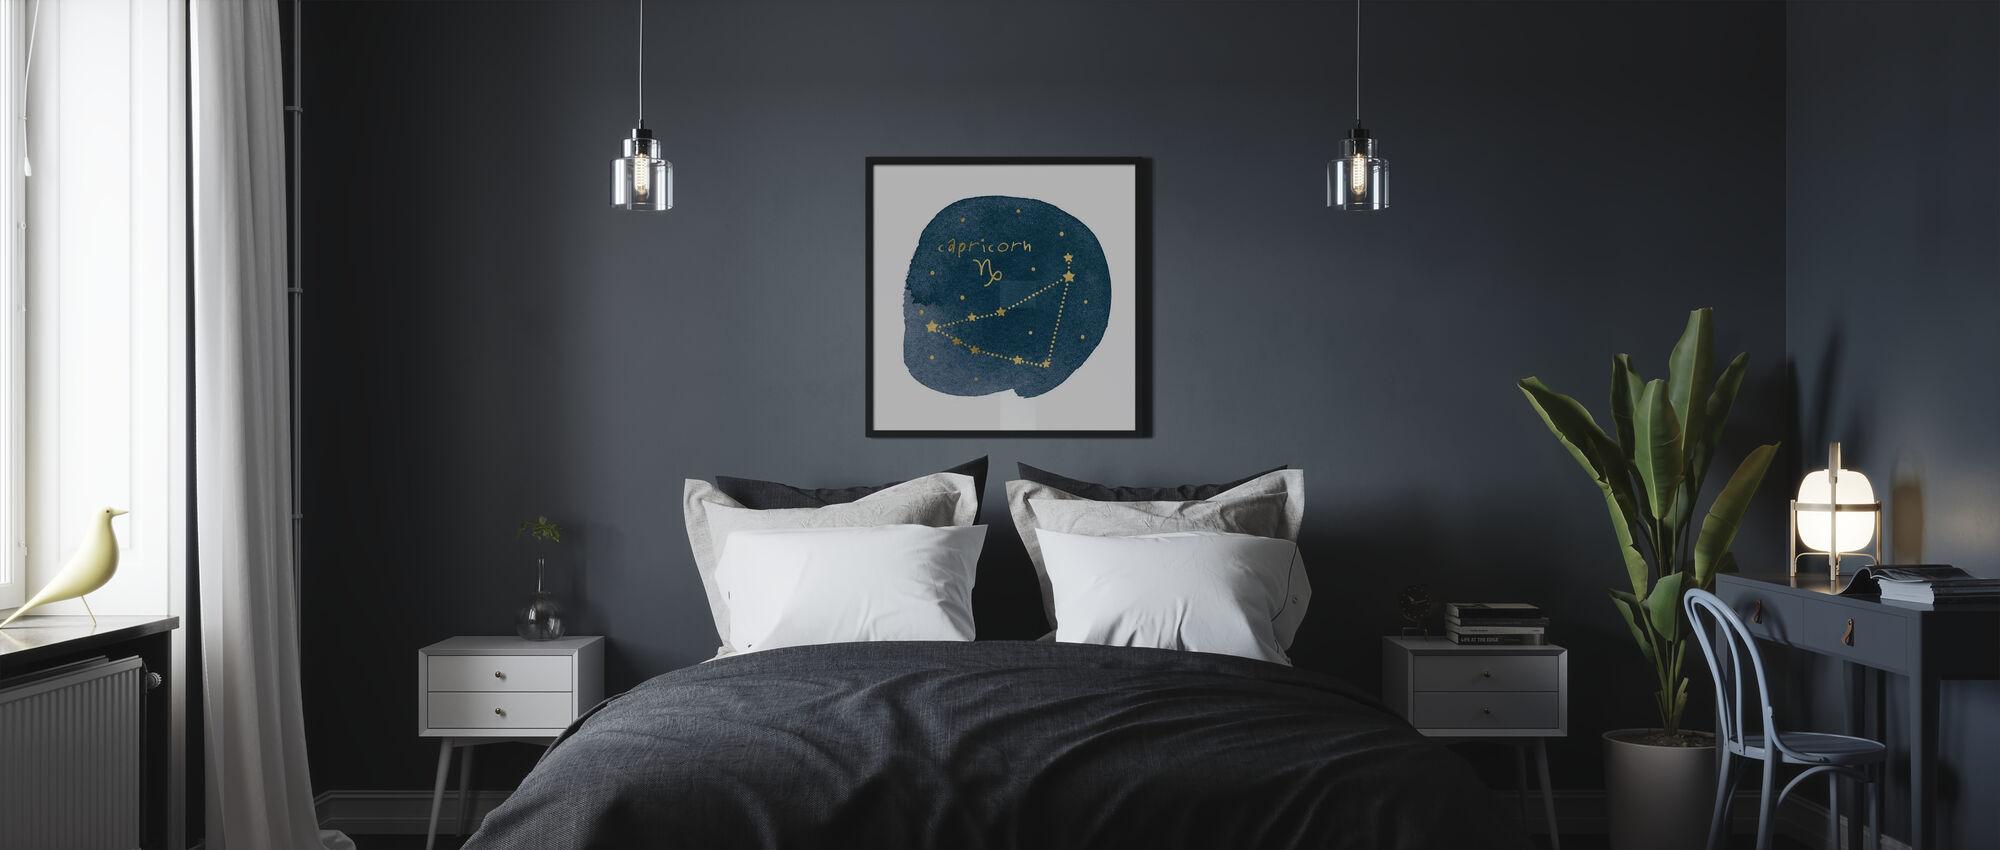 Horoskop Stenbocken - Poster - Sovrum